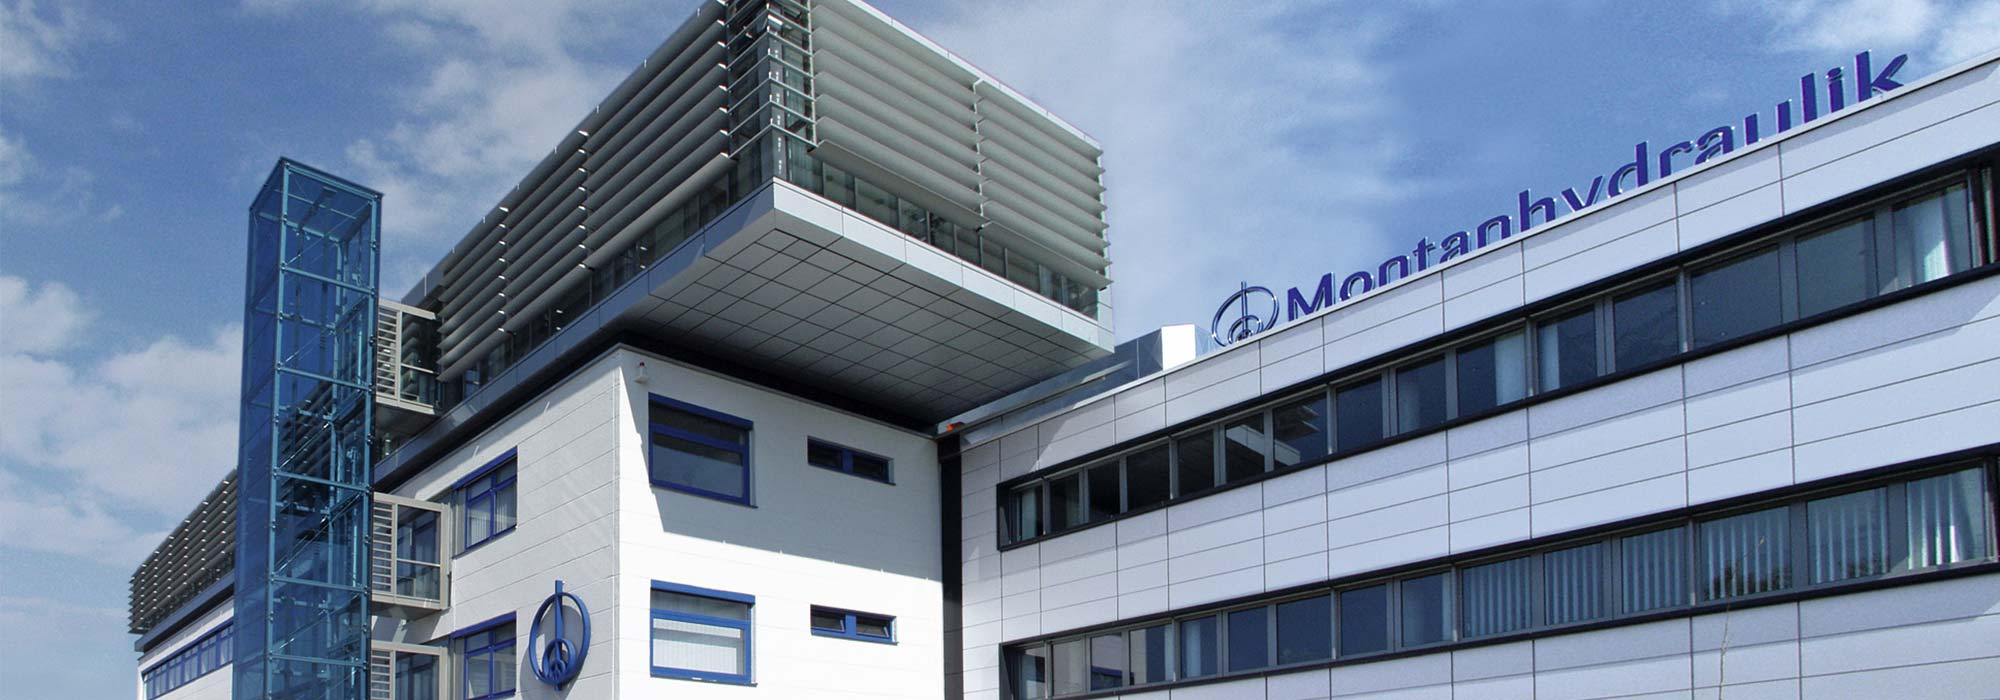 Impressum Montanhydraulik GmbH